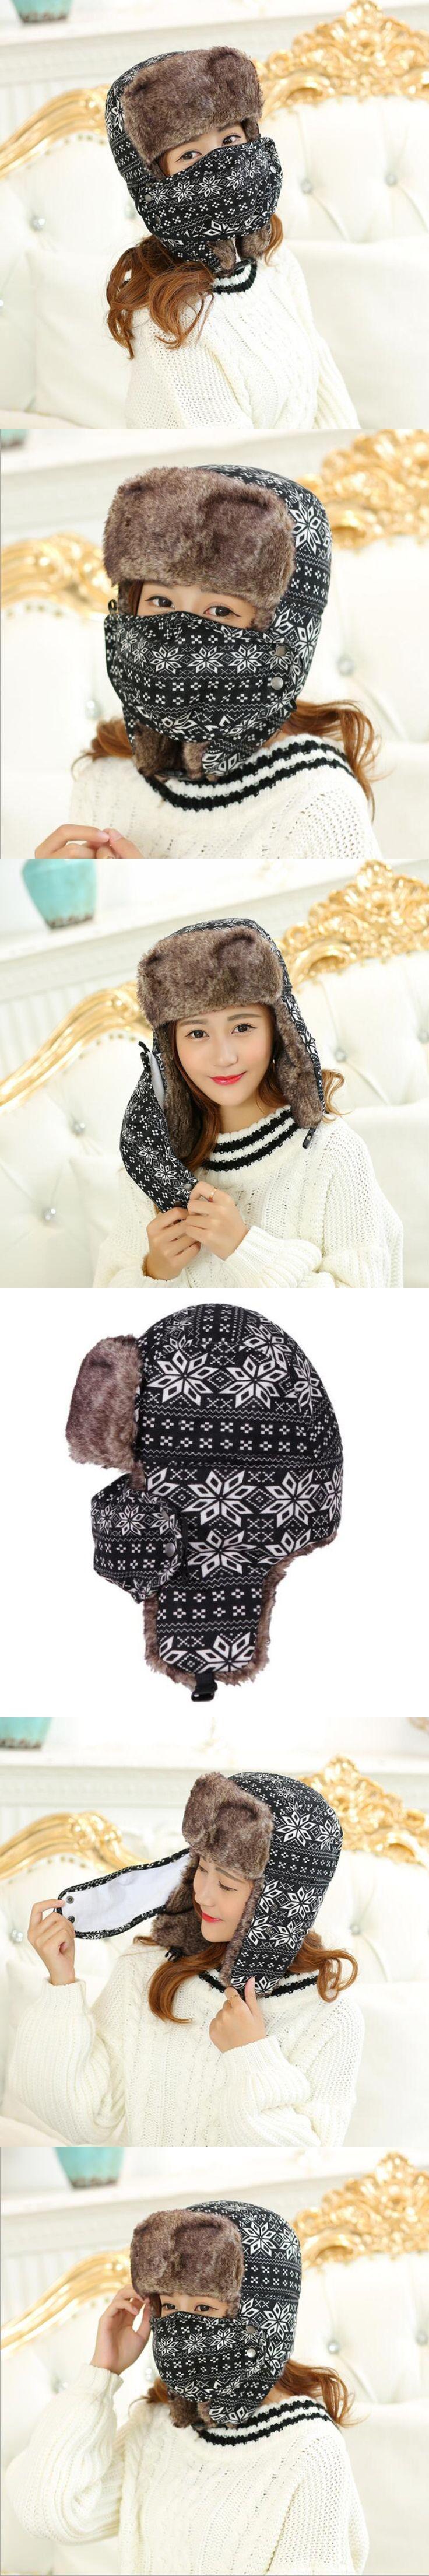 HT534 Winter Mask Bomber Hat Snow Flowers Russian Ushanka Hat Earflap Russian Fur Hat Classic Trapper Hats for Women